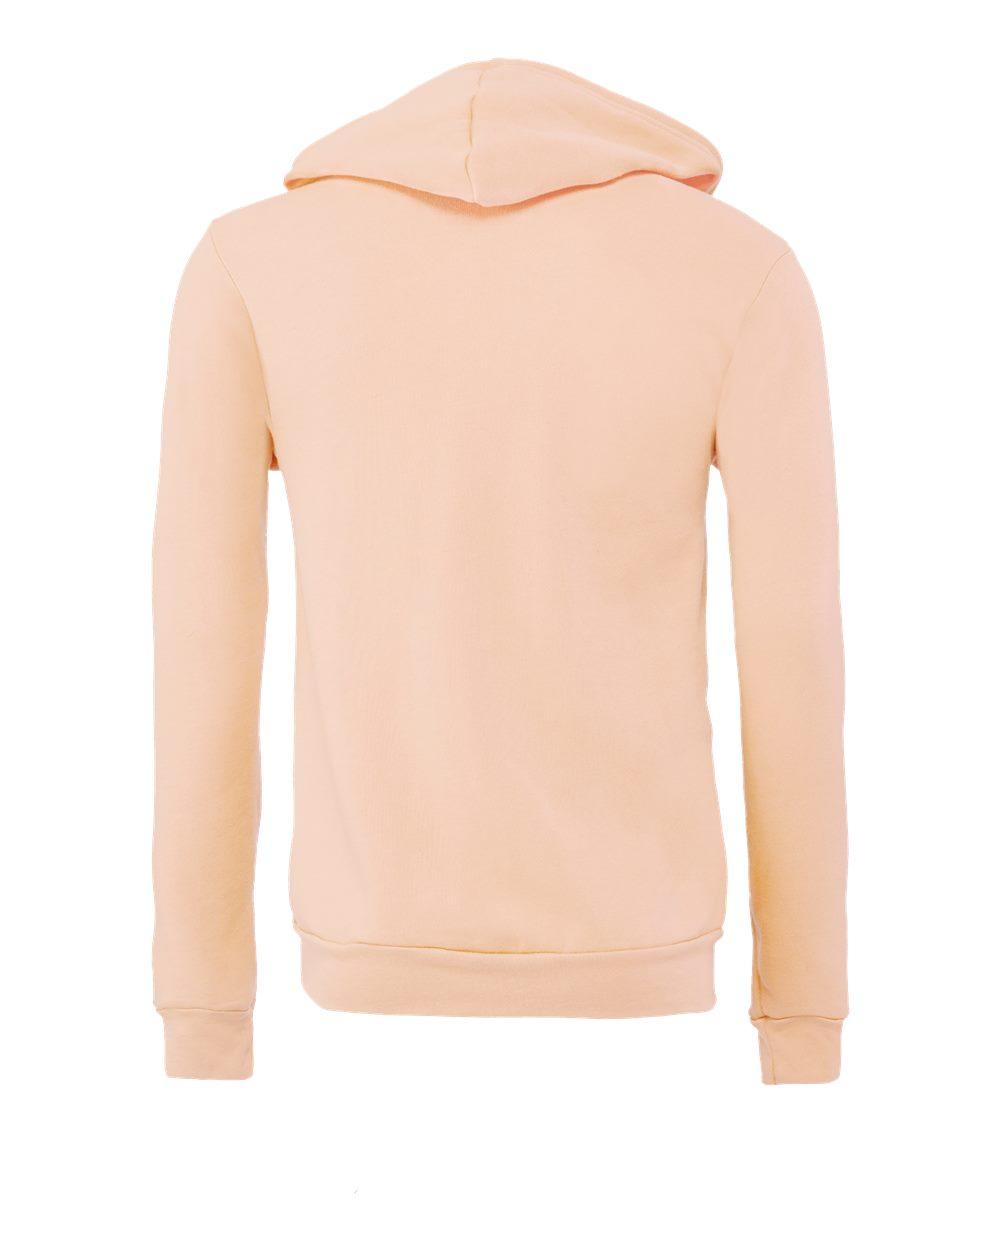 Bella-Canvas-Unisex-Full-Zip-Up-Hooded-Sweatshirt-Blank-Hoodie-3739-up-to-3XL thumbnail 78